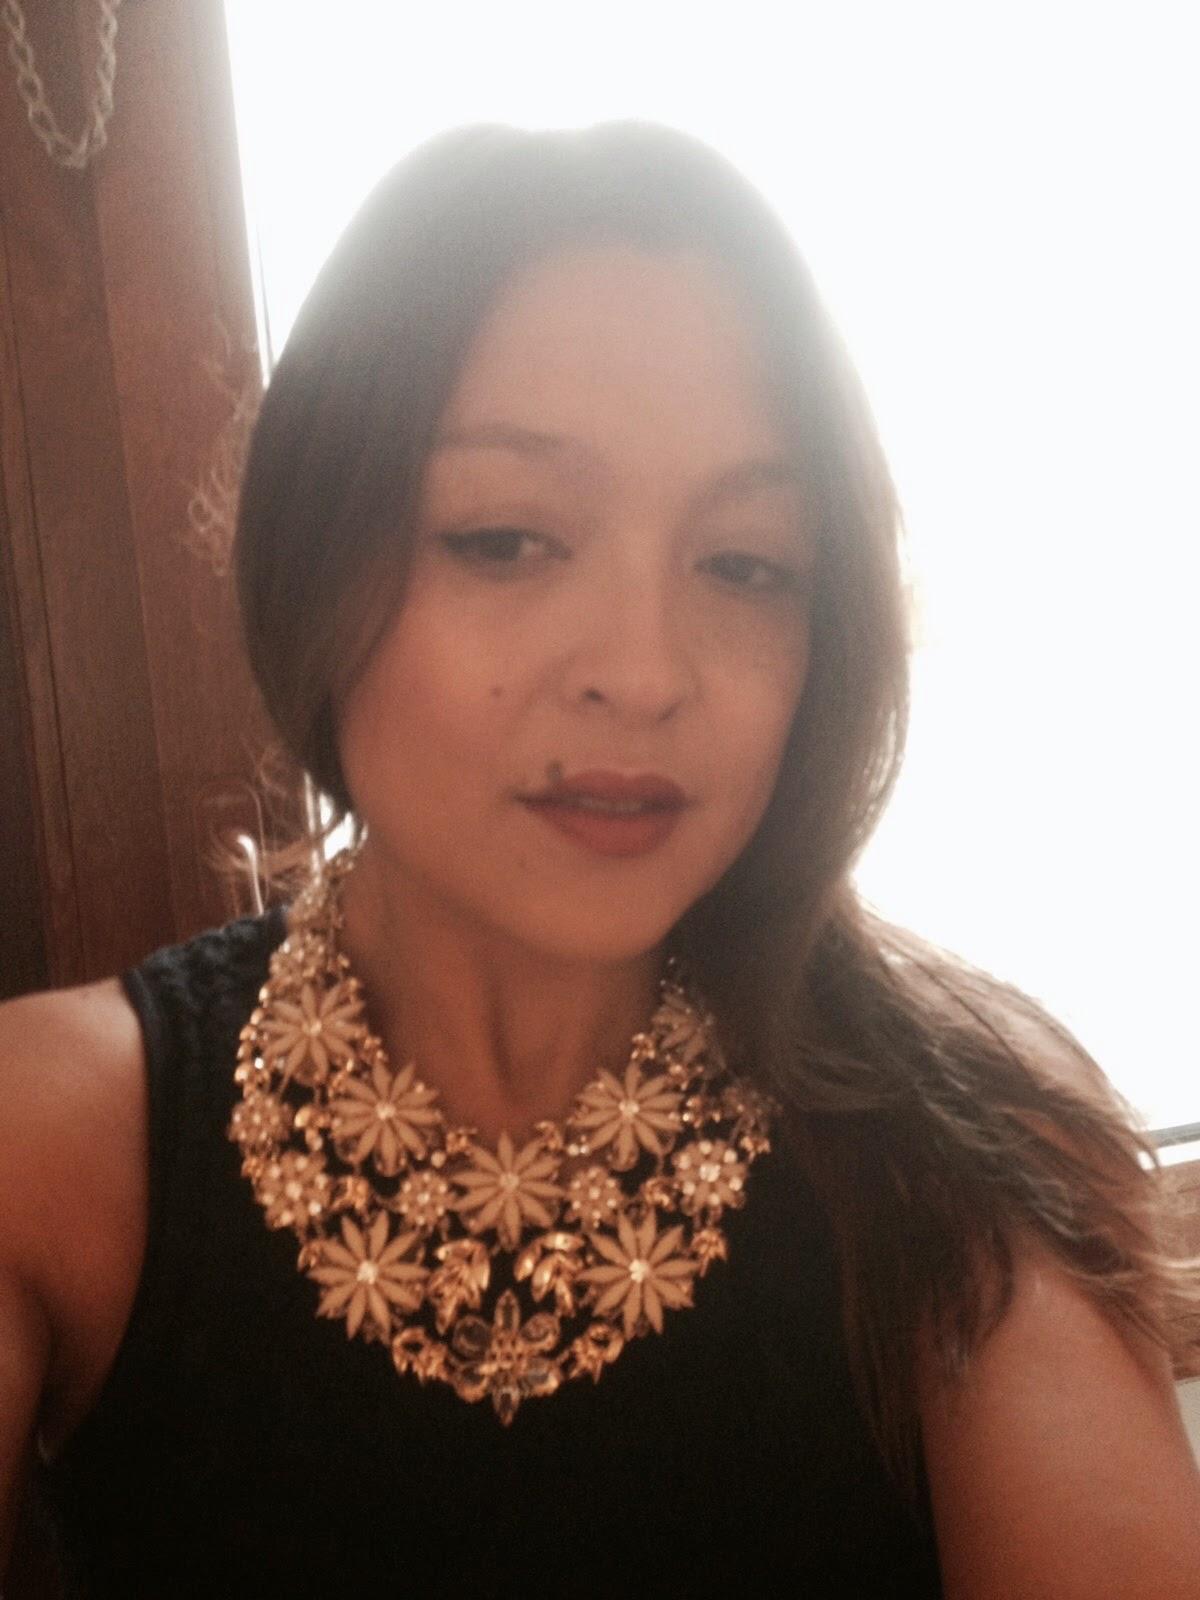 Collier BCBG jewelry accessories accessoires bijoux fantaisie necklace blog mode metz luxembourg